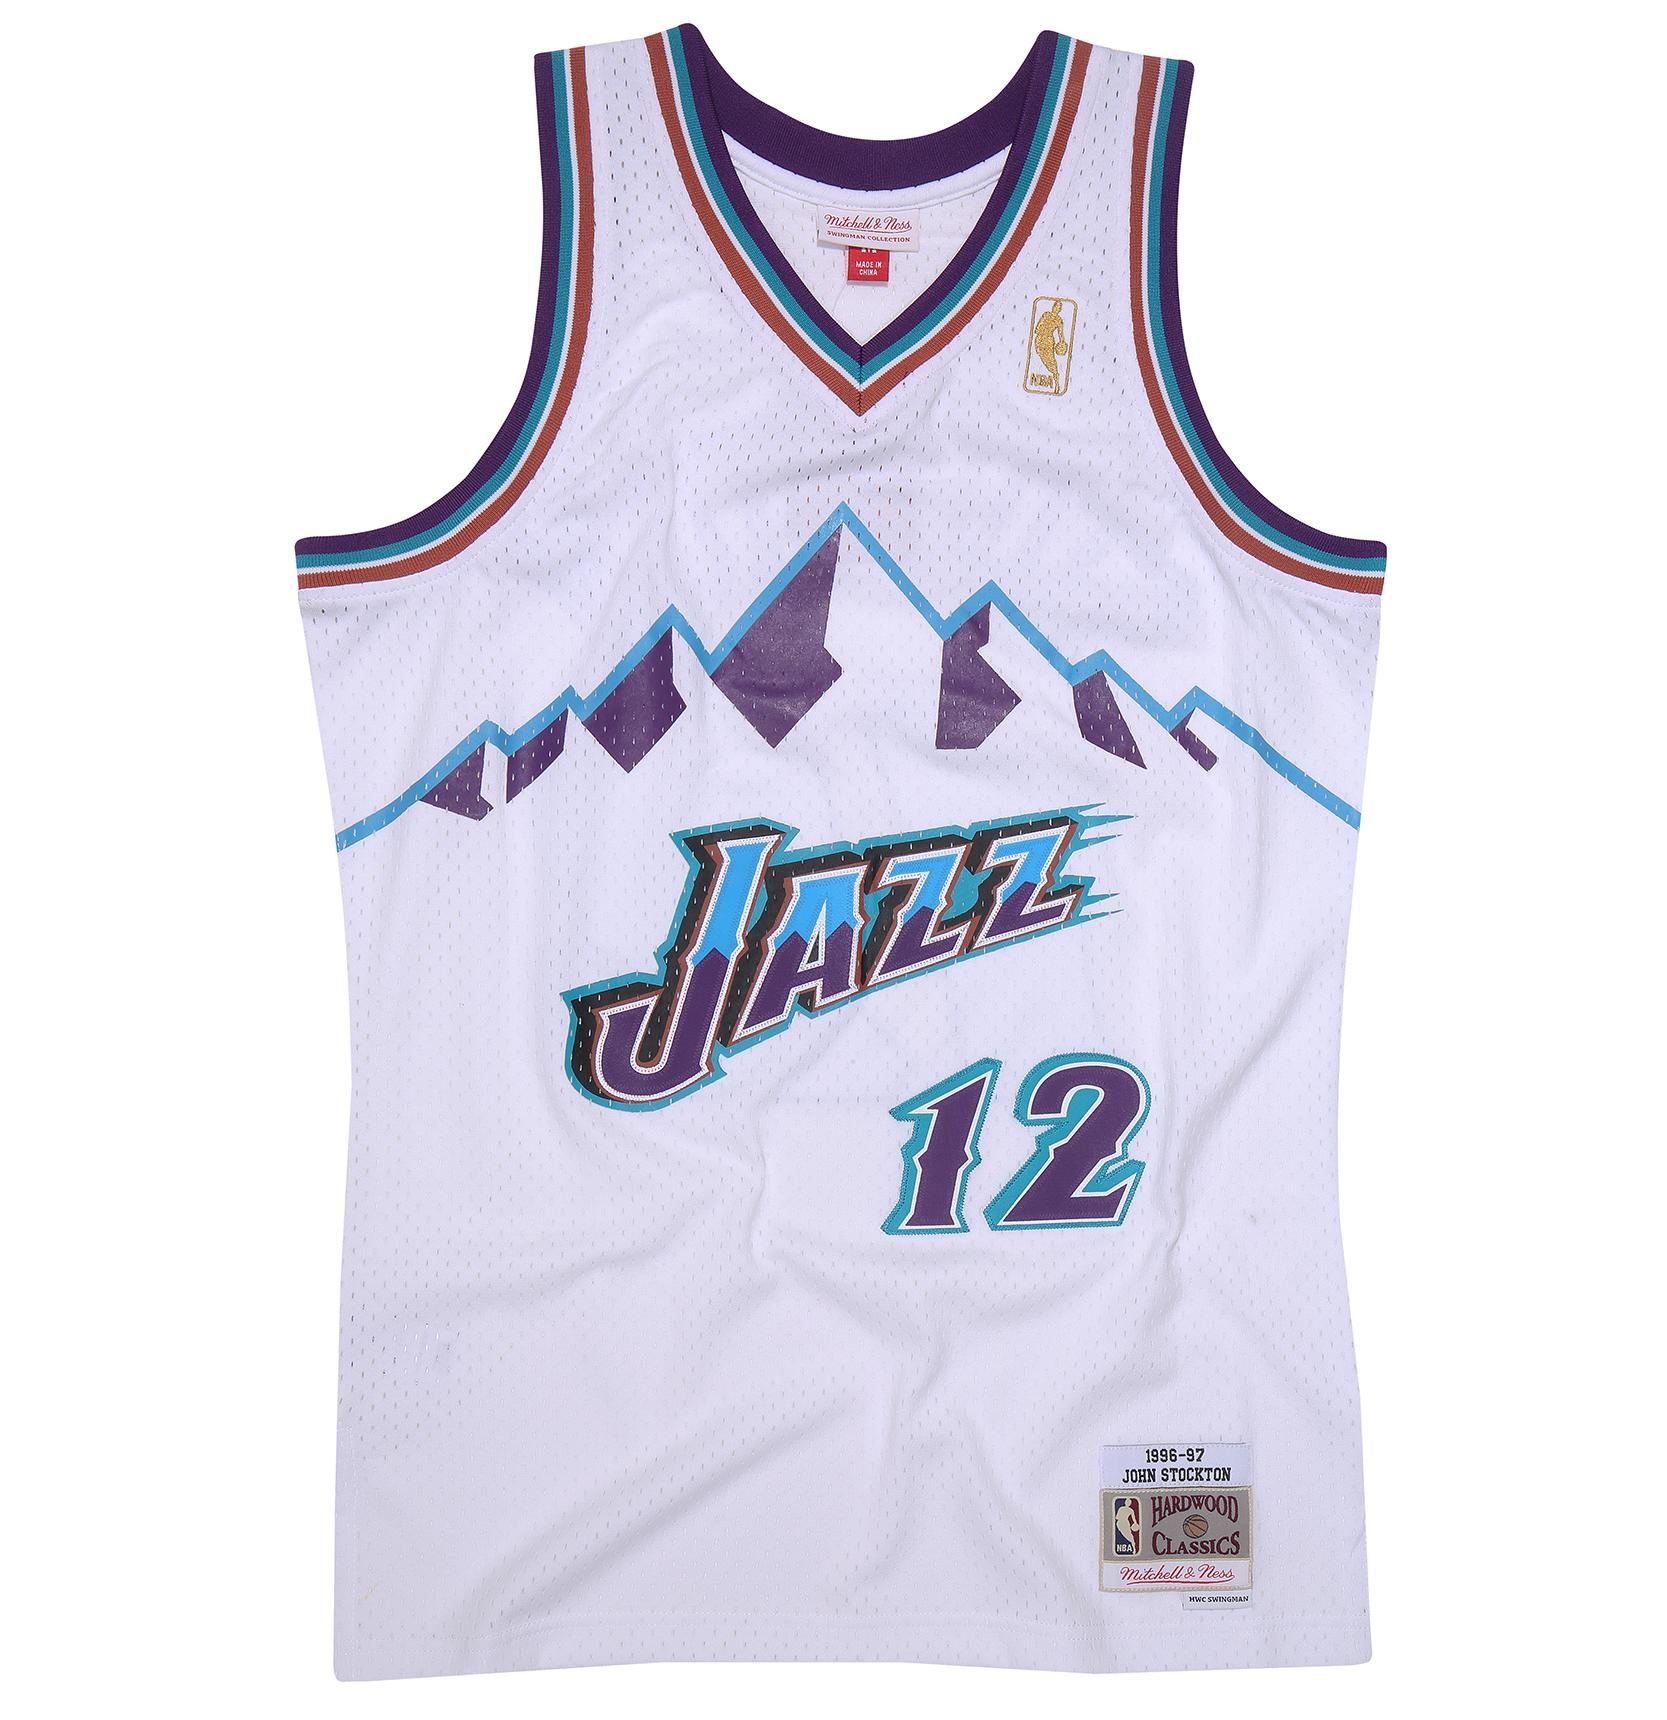 John Stockton 1996-97 Home Swingman Jersey Utah Jazz a9db590ec